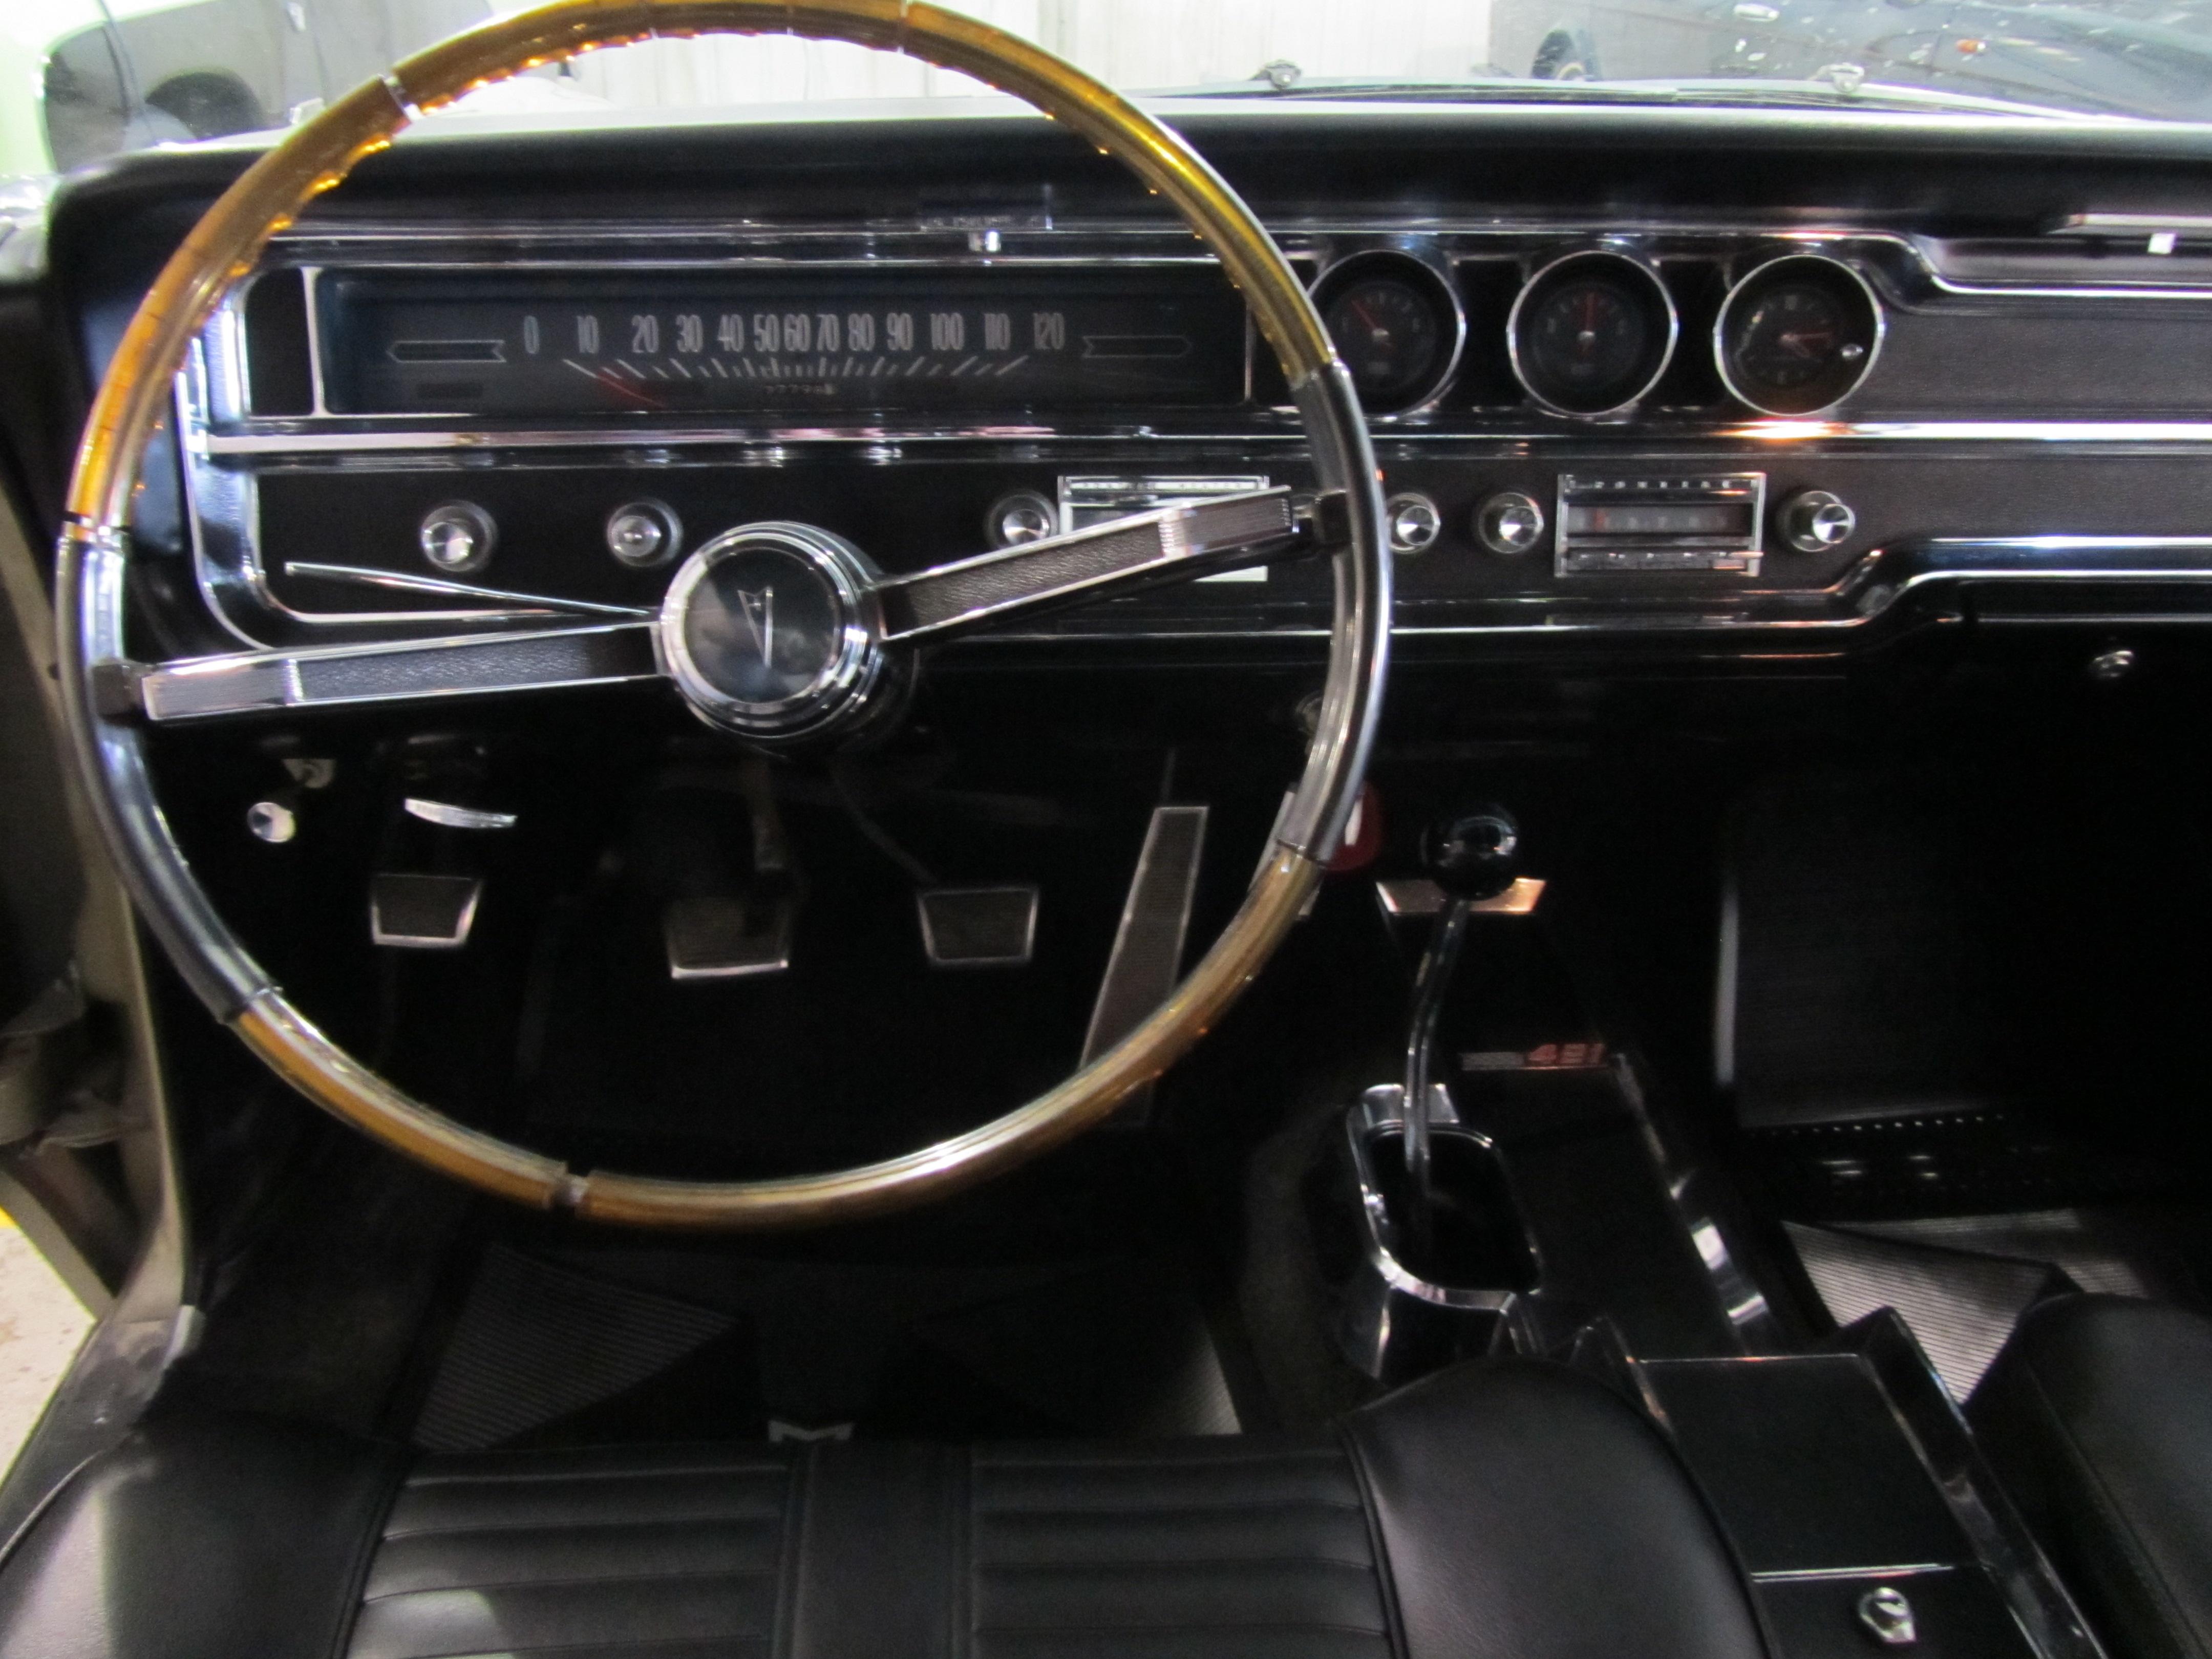 1965 Pontiac Catalina 2+2 | D&B Motors - Great Bend, KS